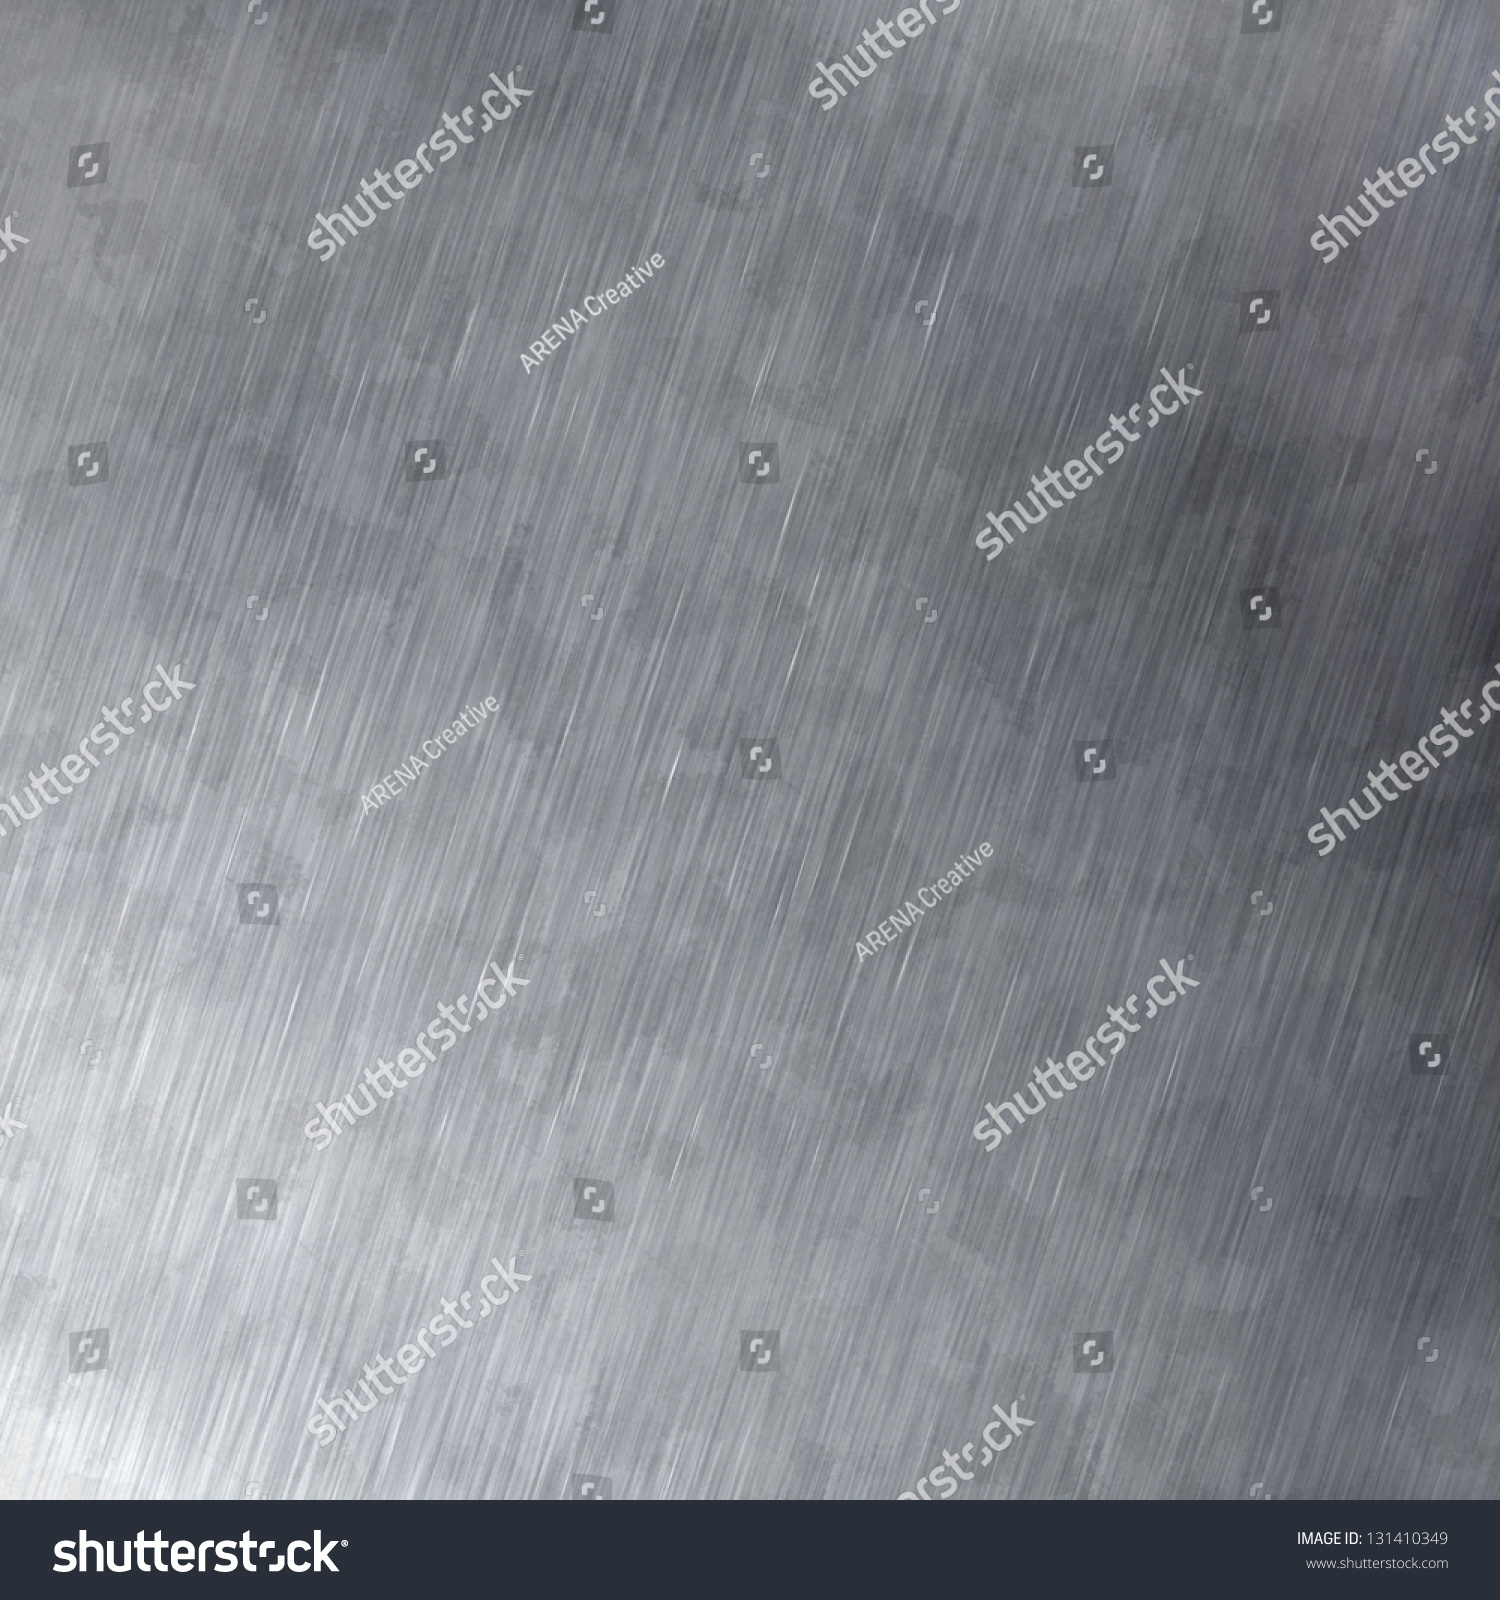 Anodized Looking Brushed Aluminum Illustration That Stock ...